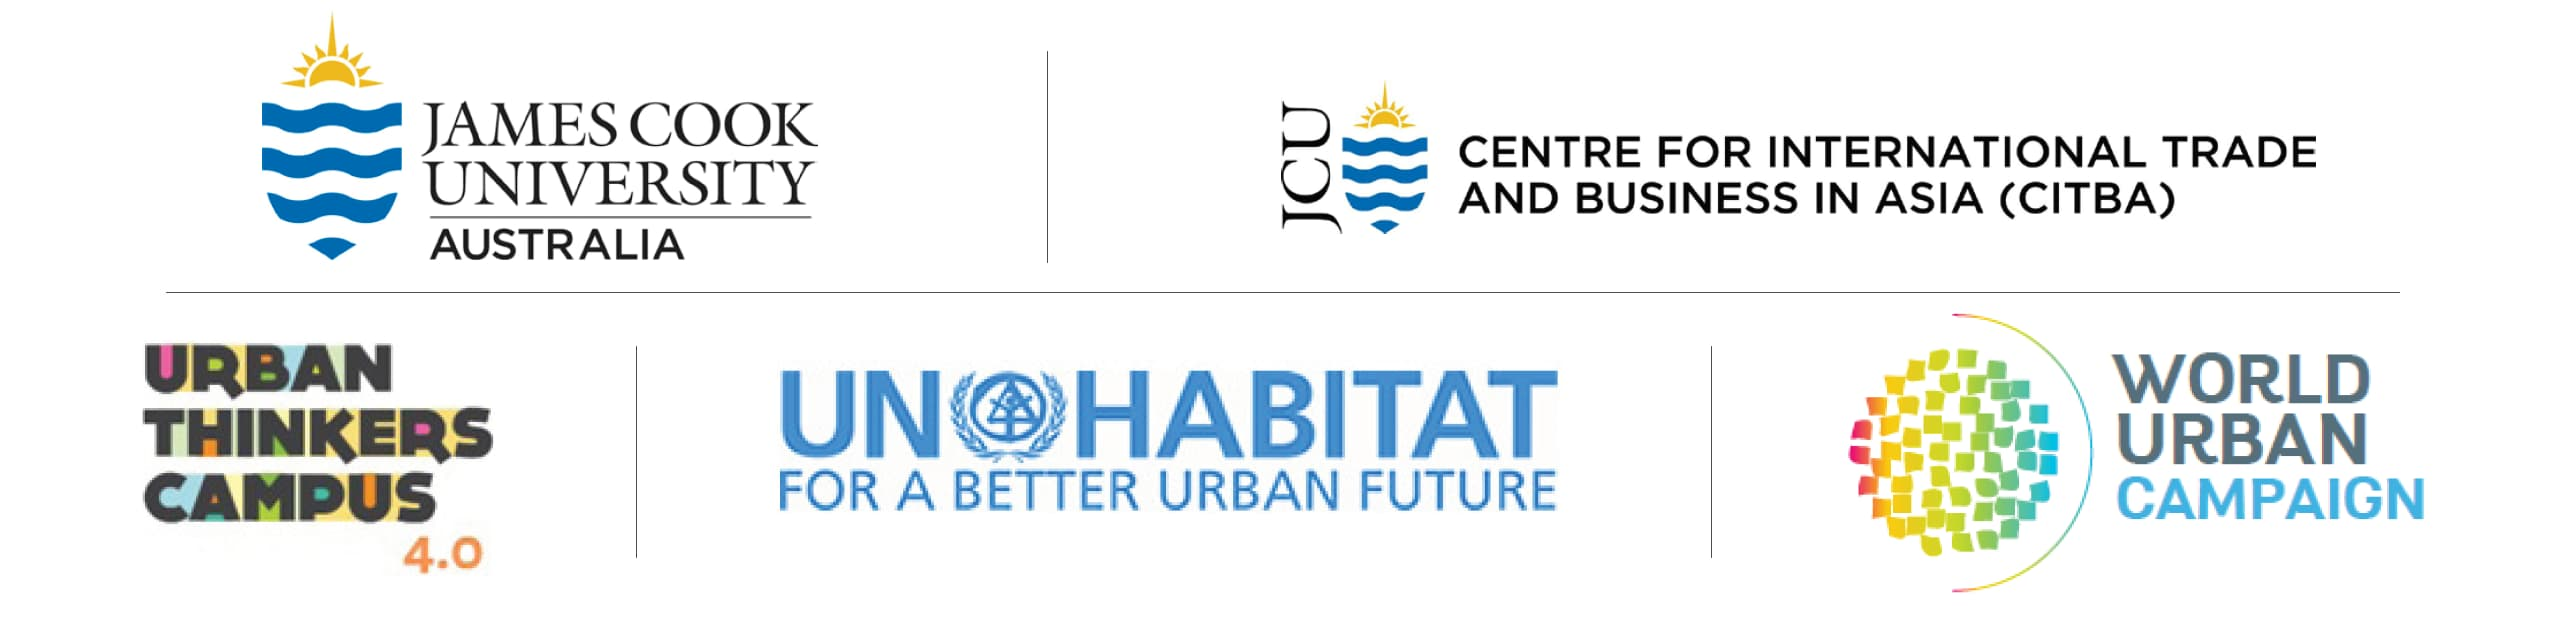 CITBA logos